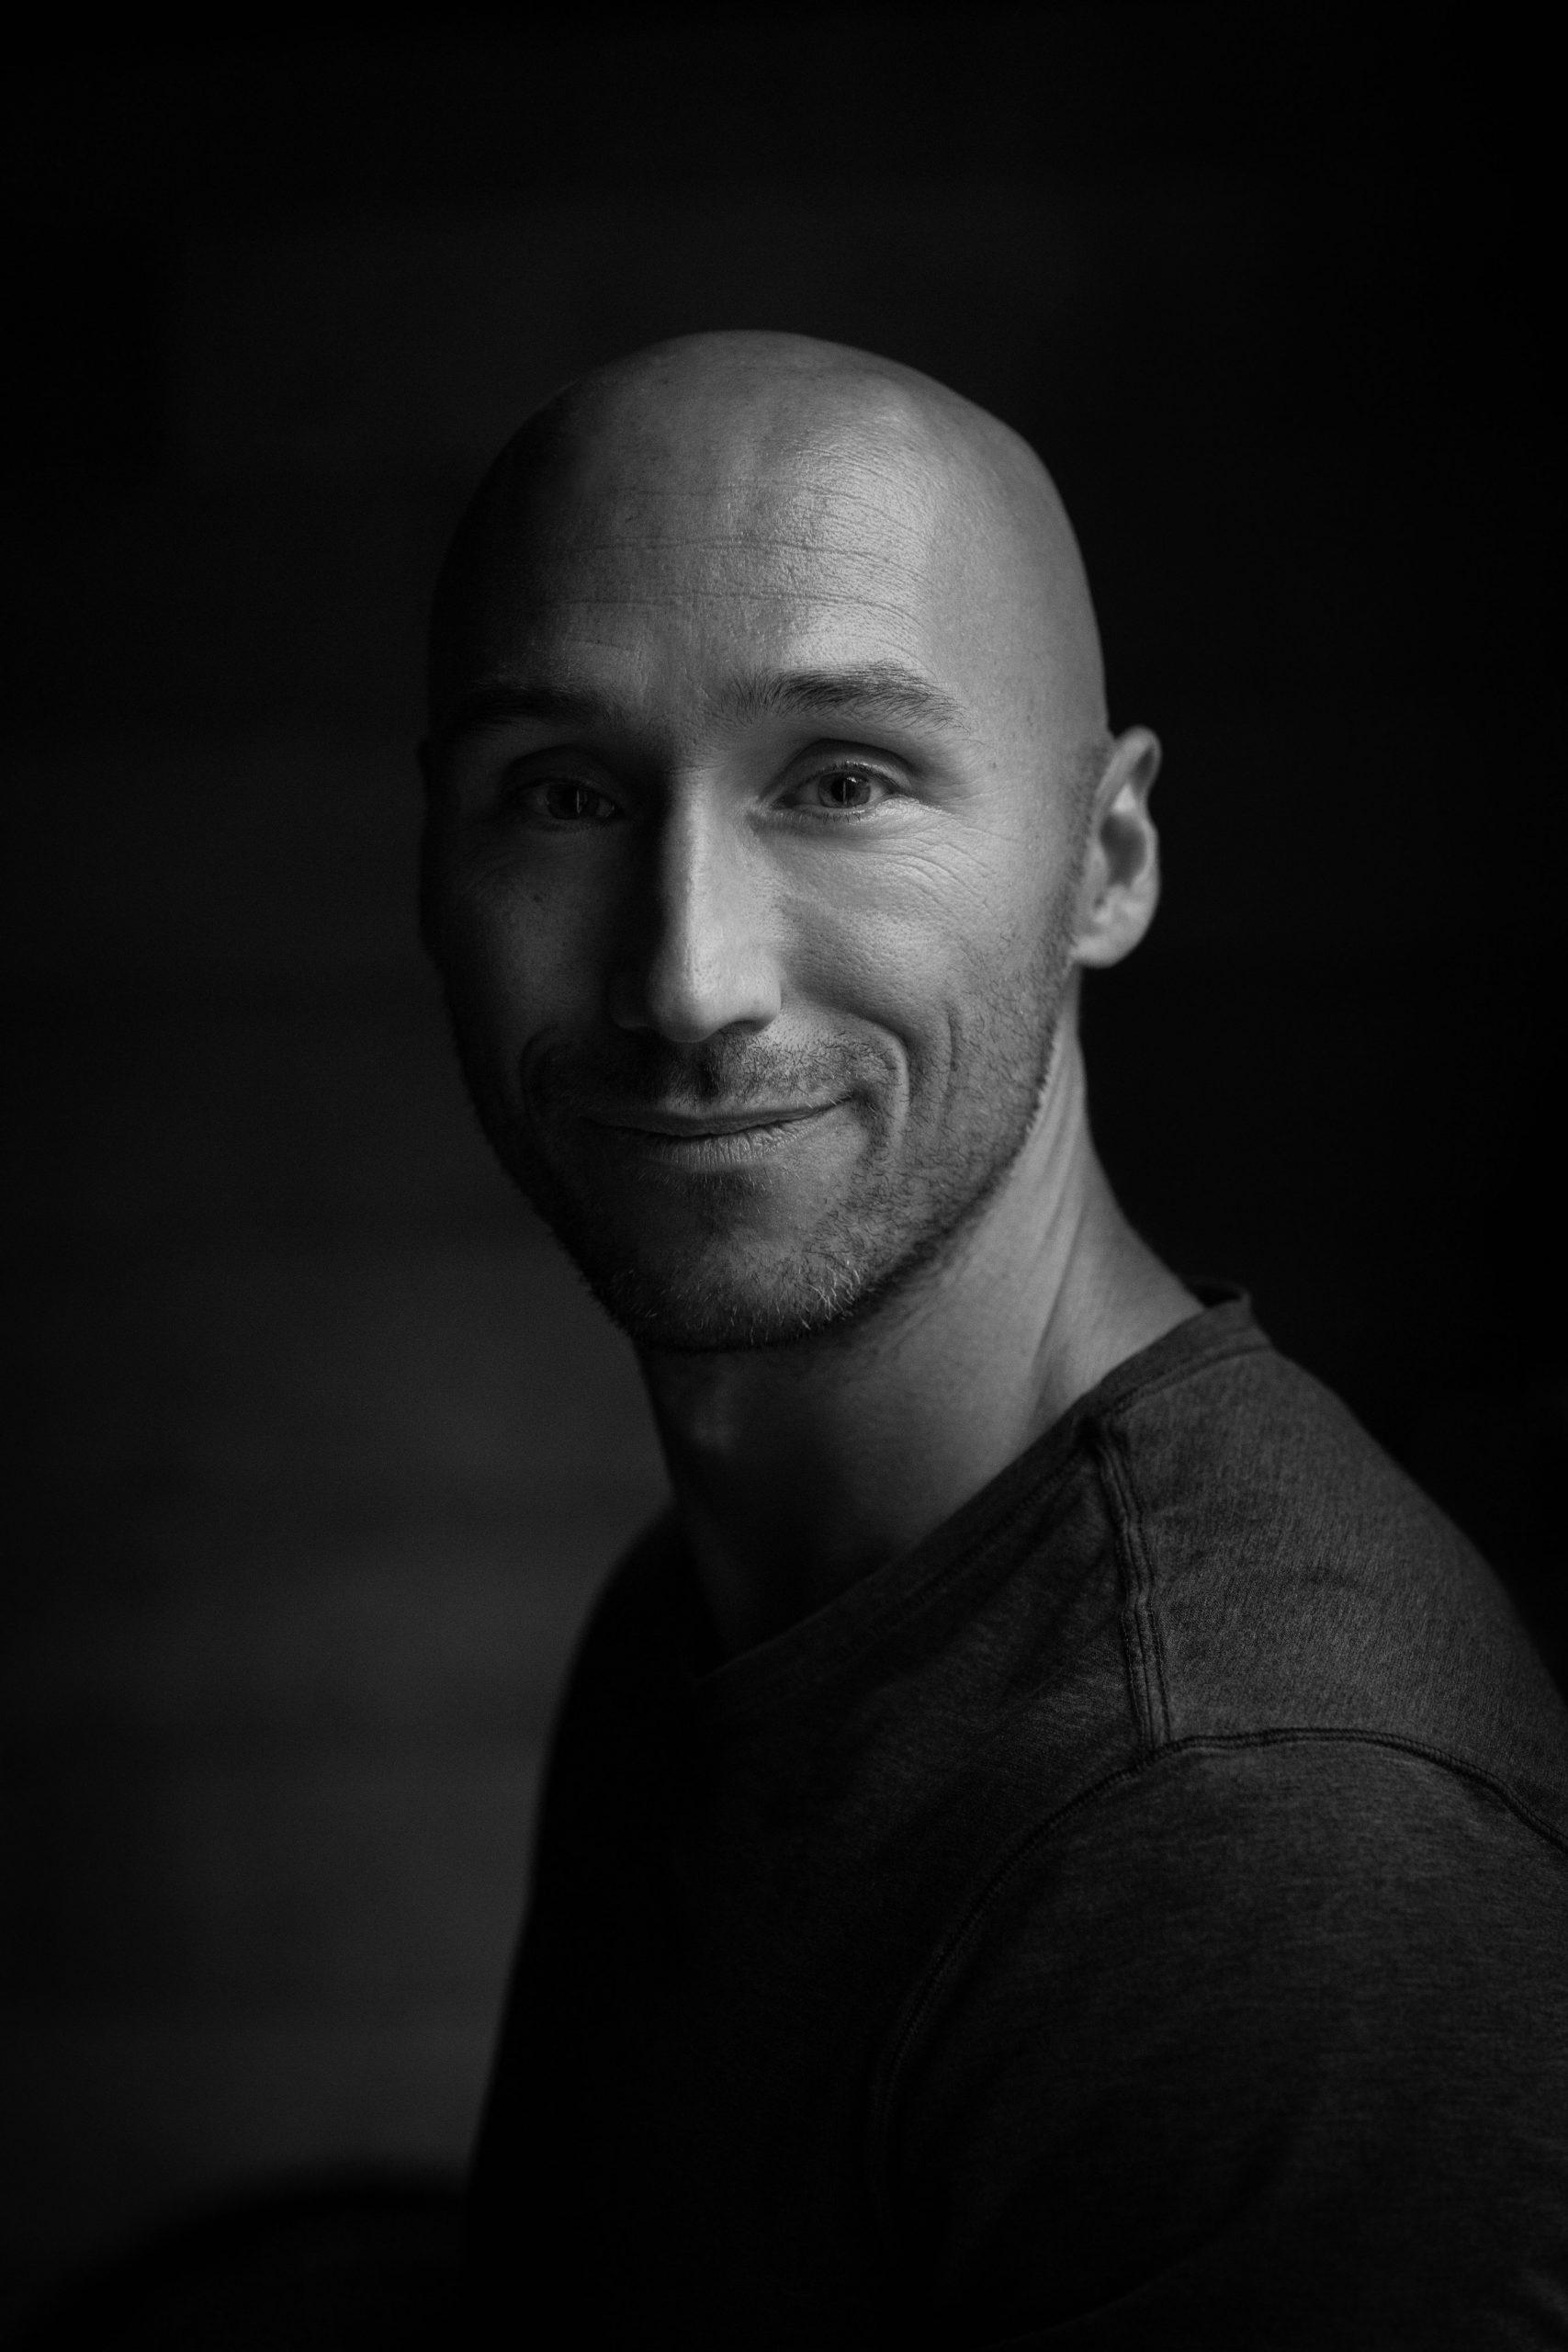 Marc-André Seers